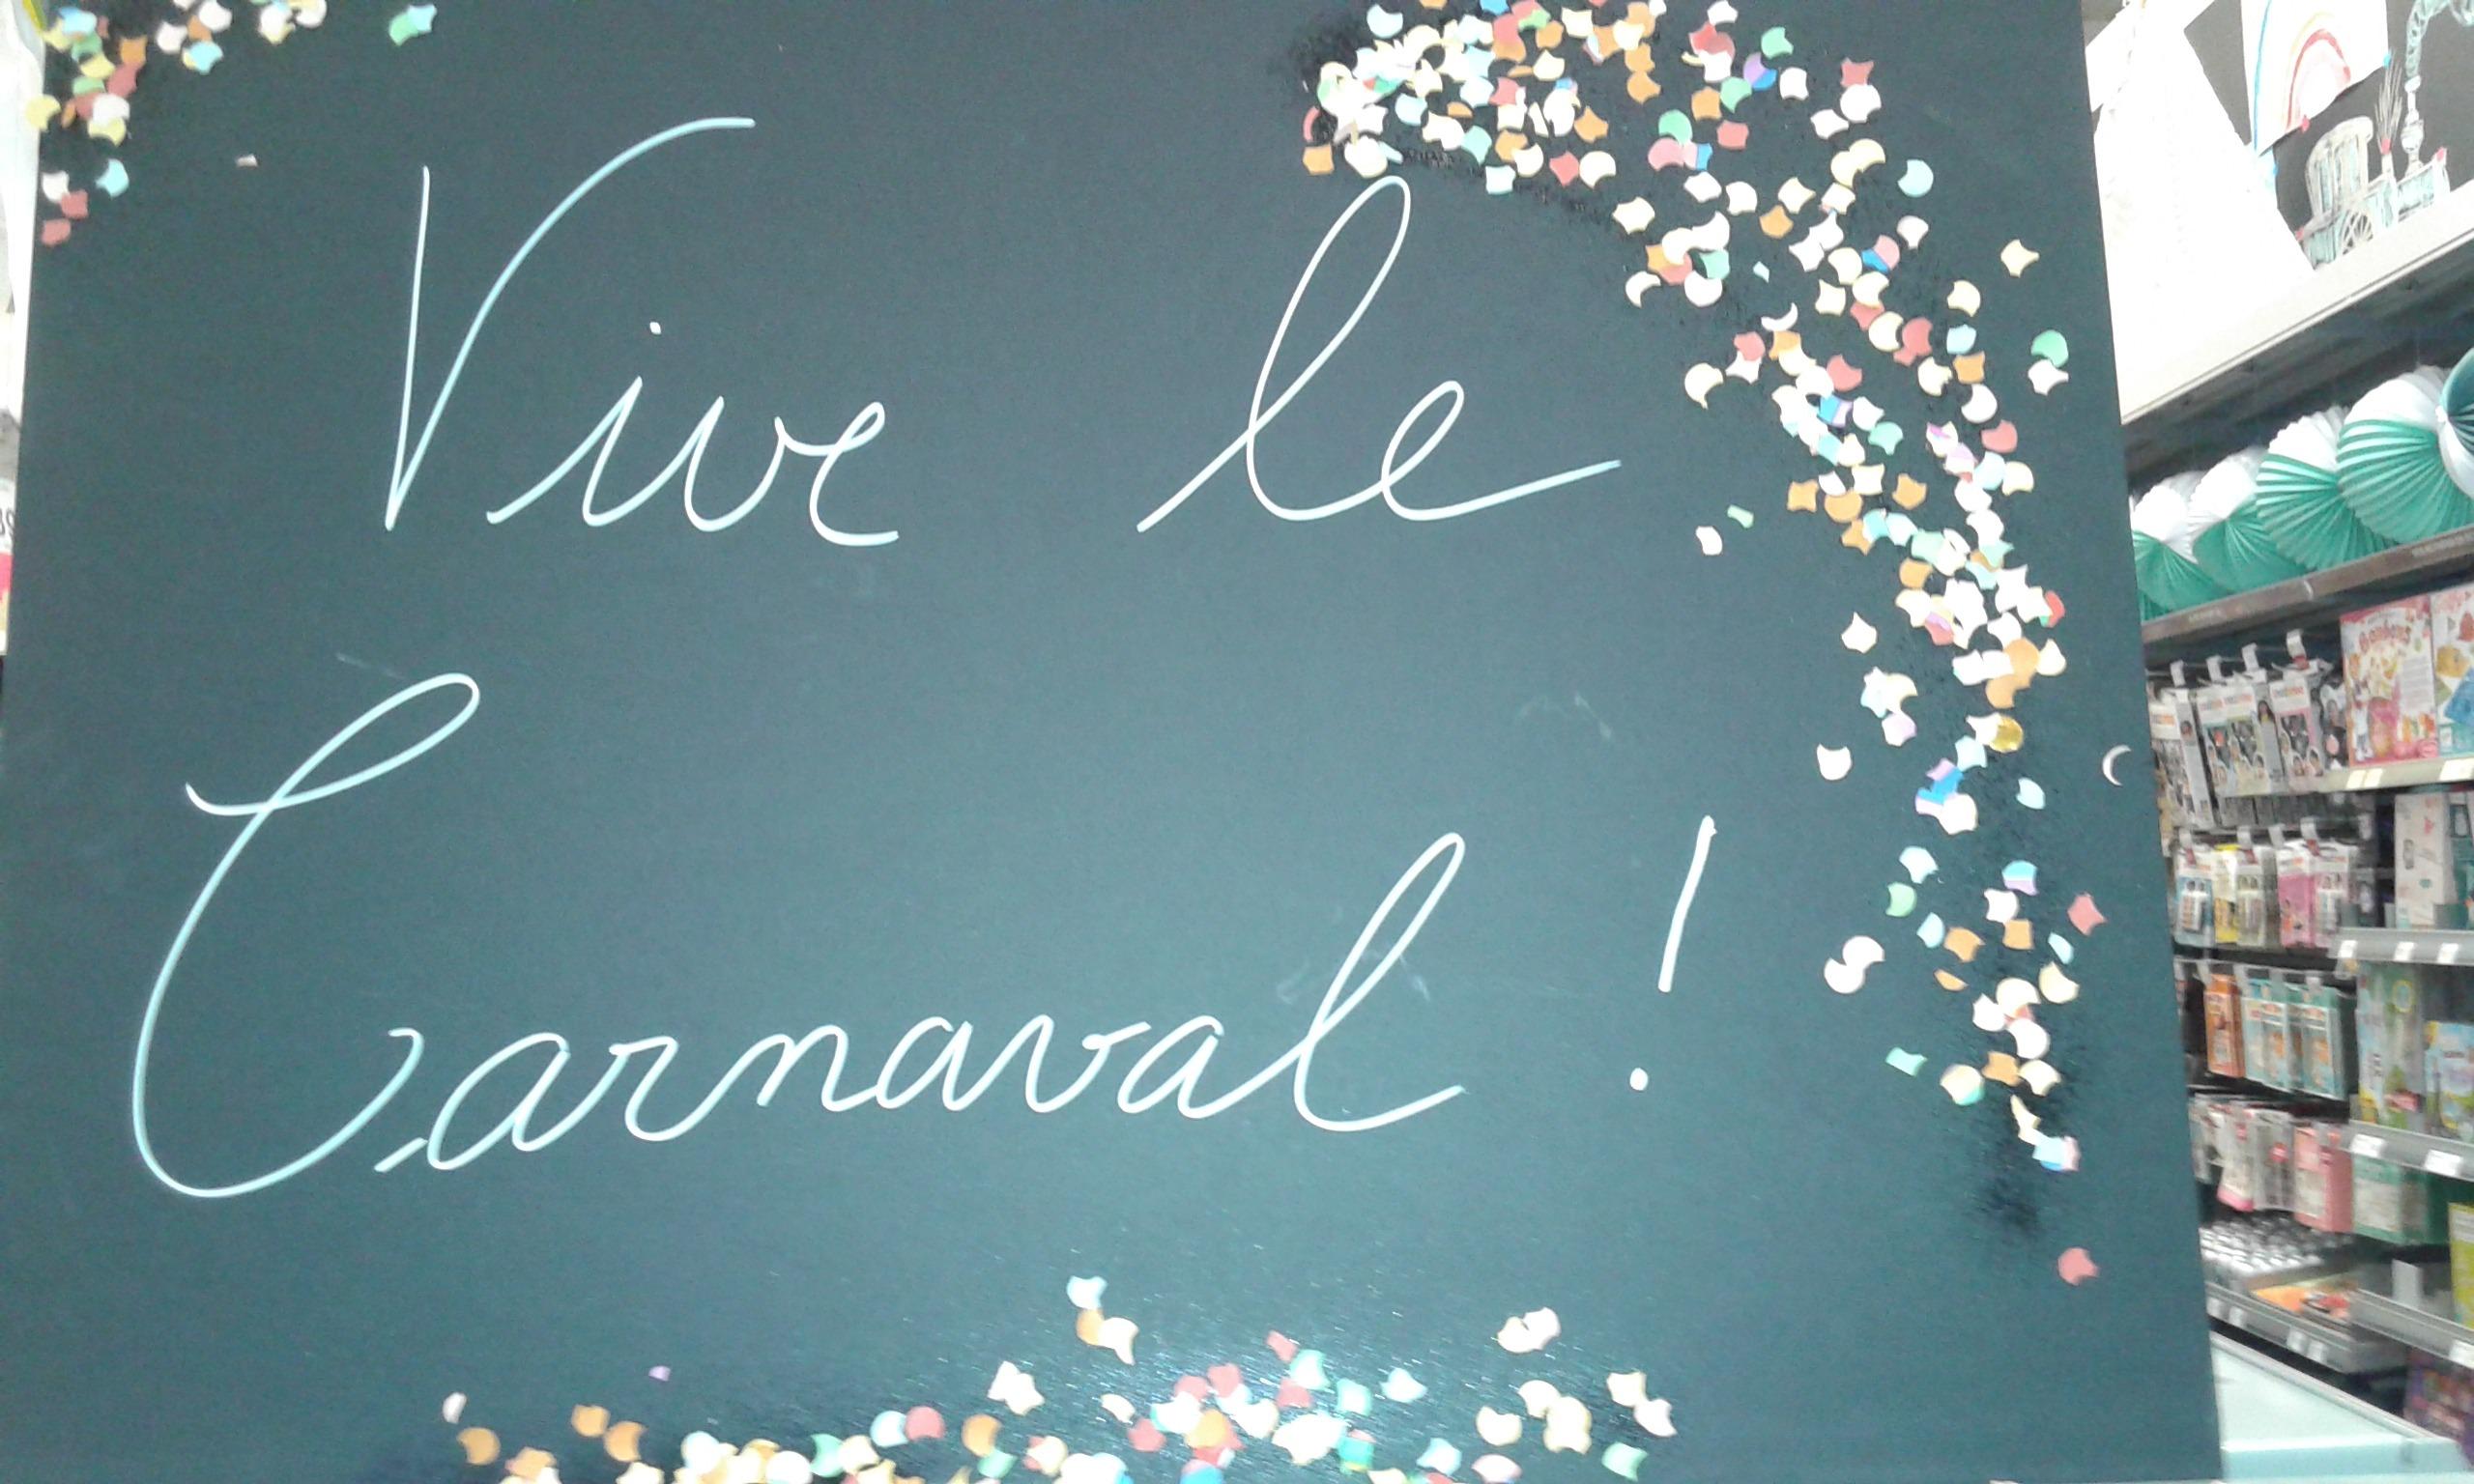 Vive le Carnaval chez Zodio !!!!!!!!